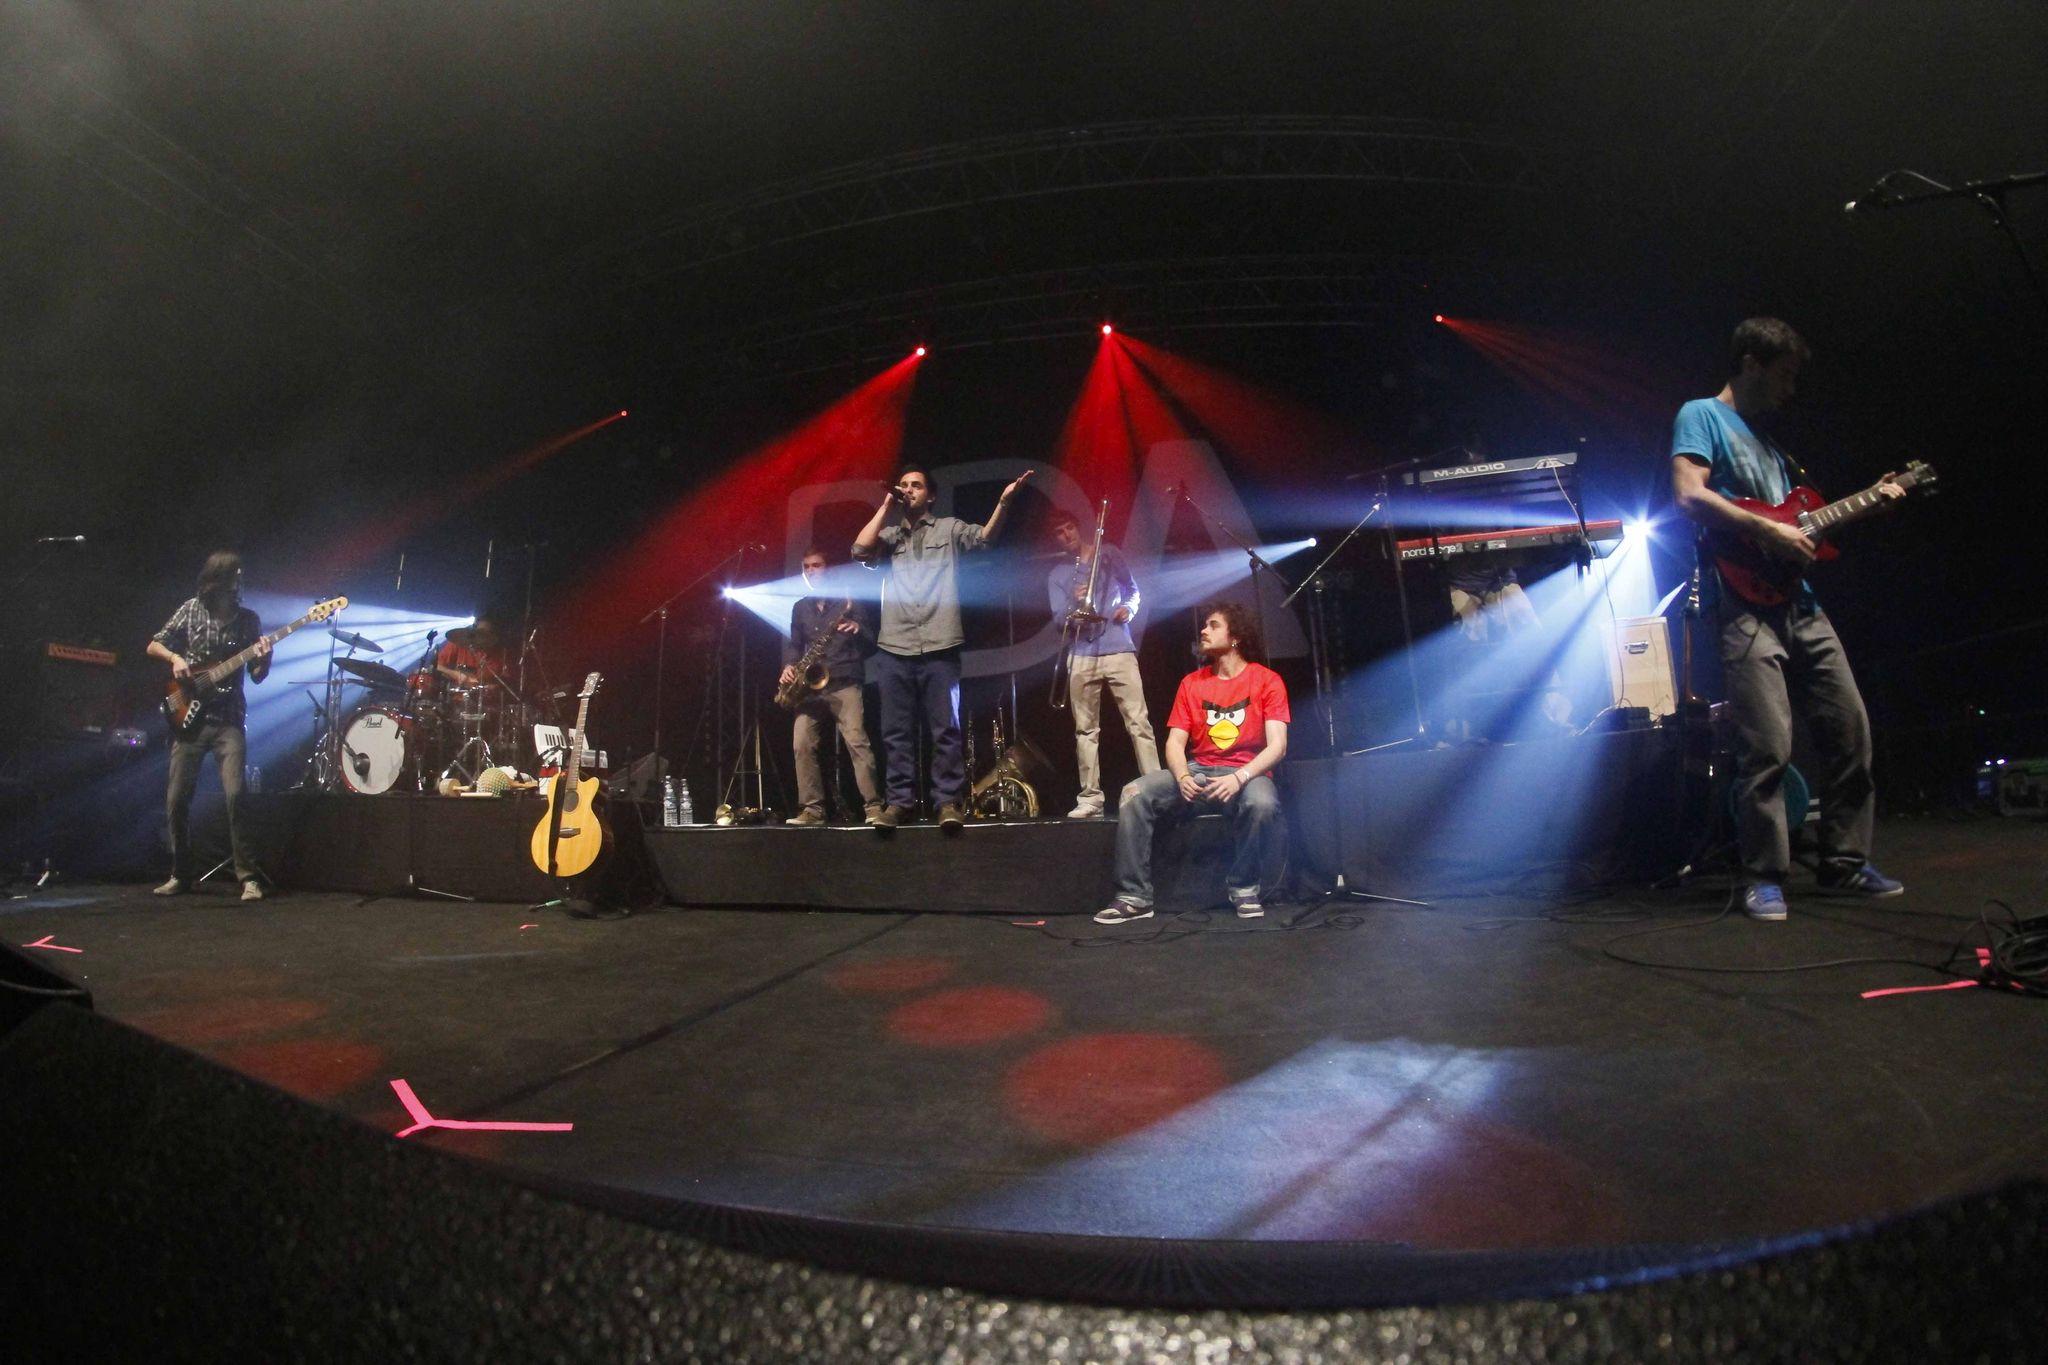 BoulevarddesAirs-Betizfest-Cambrai-2013-4